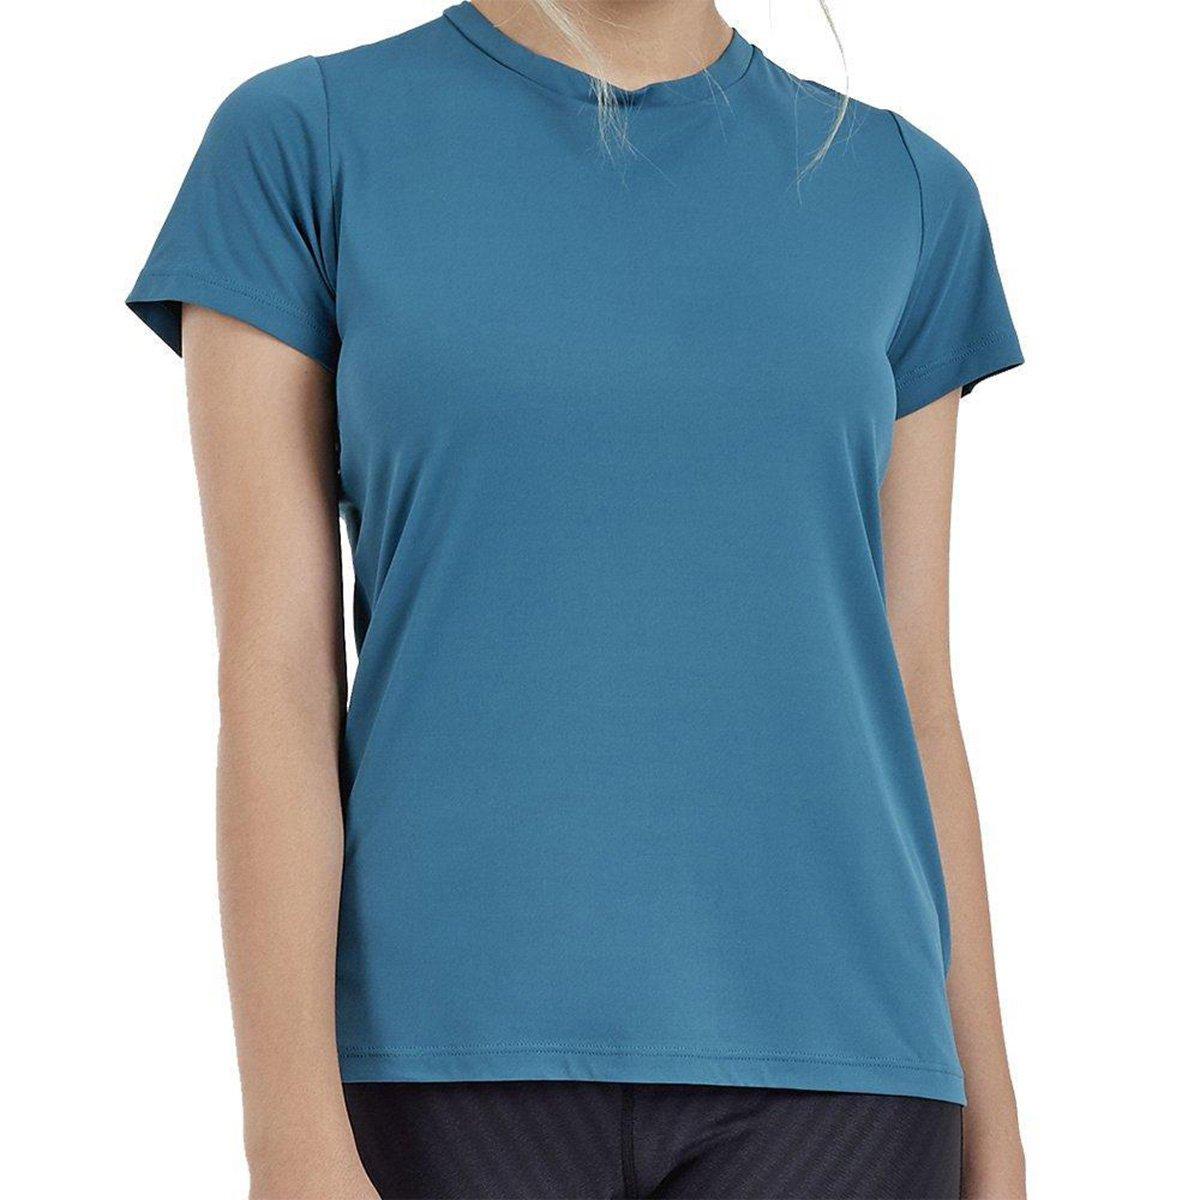 Camiseta Alto Giro Skin Fit Rolete Costas Feminina